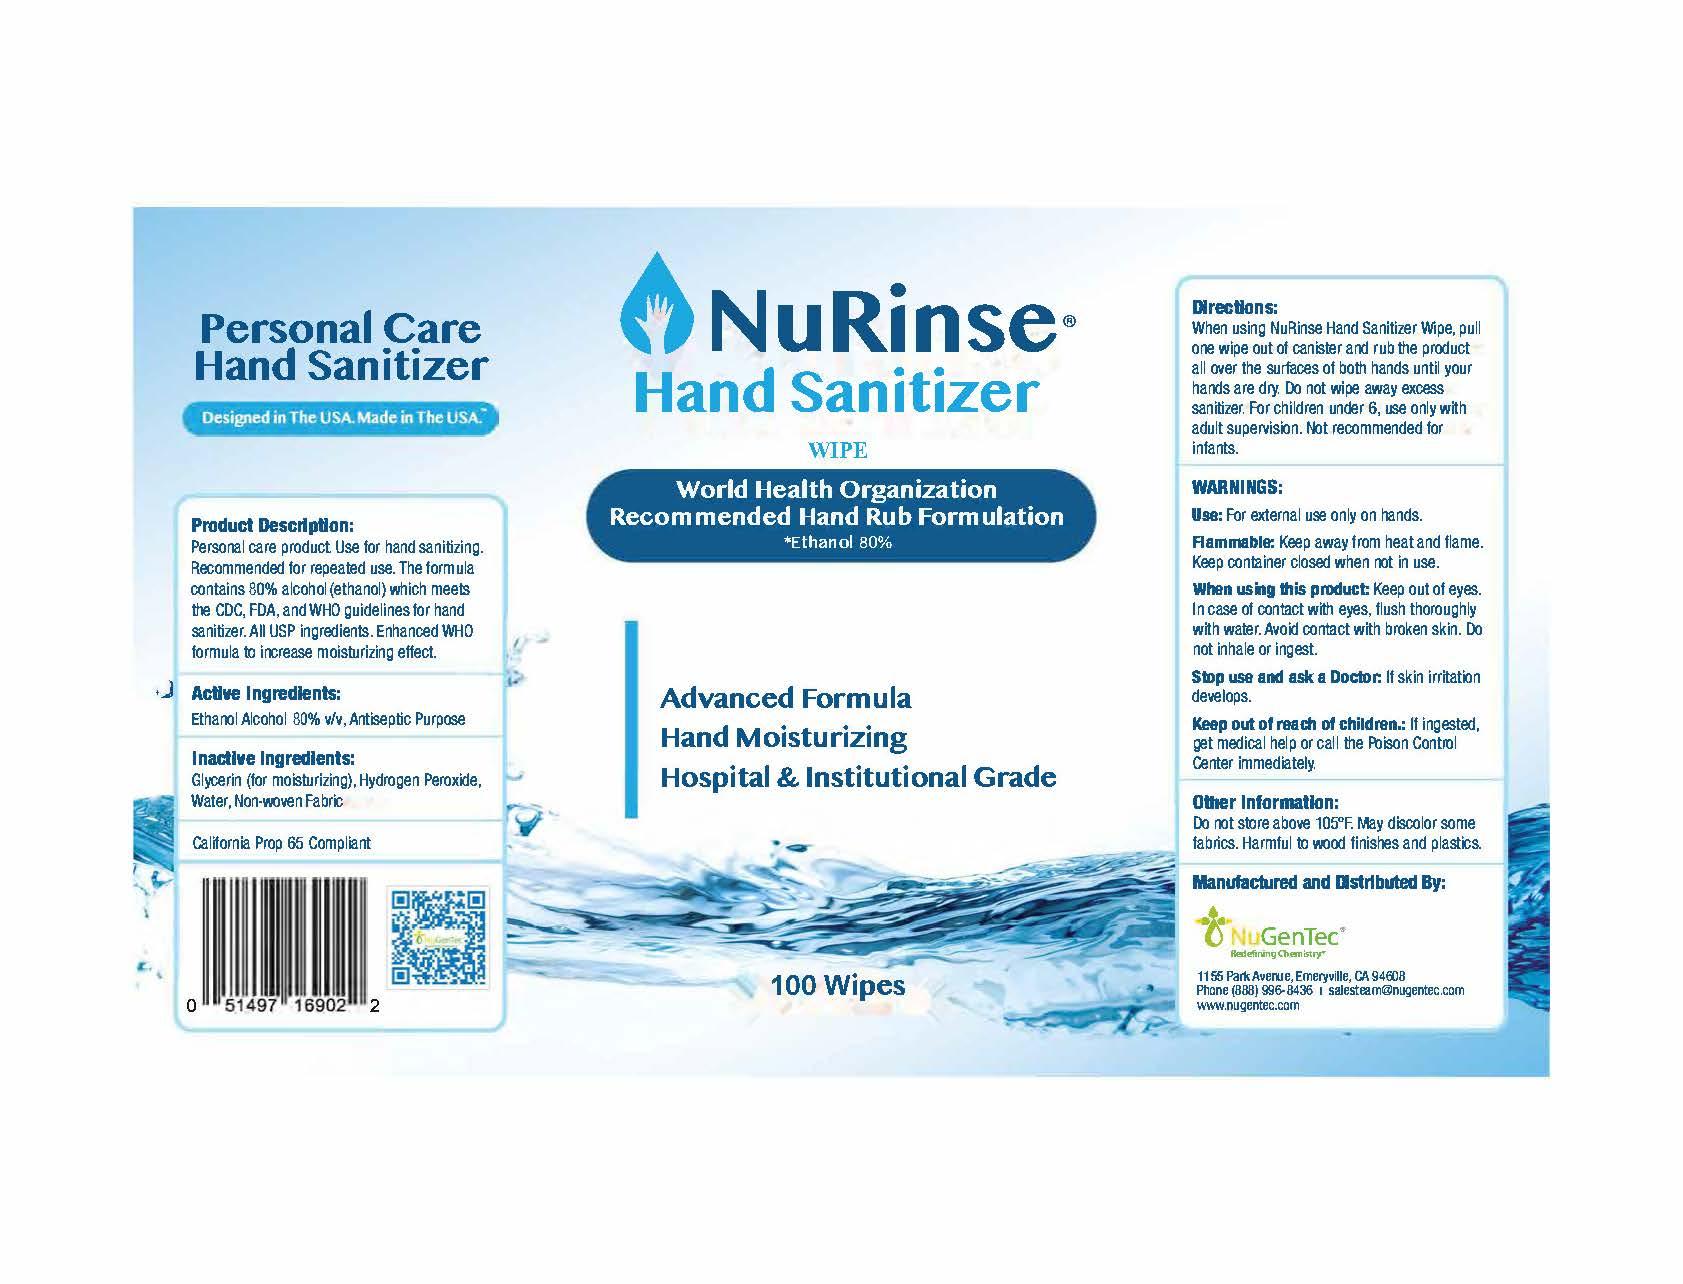 NuRinse- 100 Wipe Label 80%